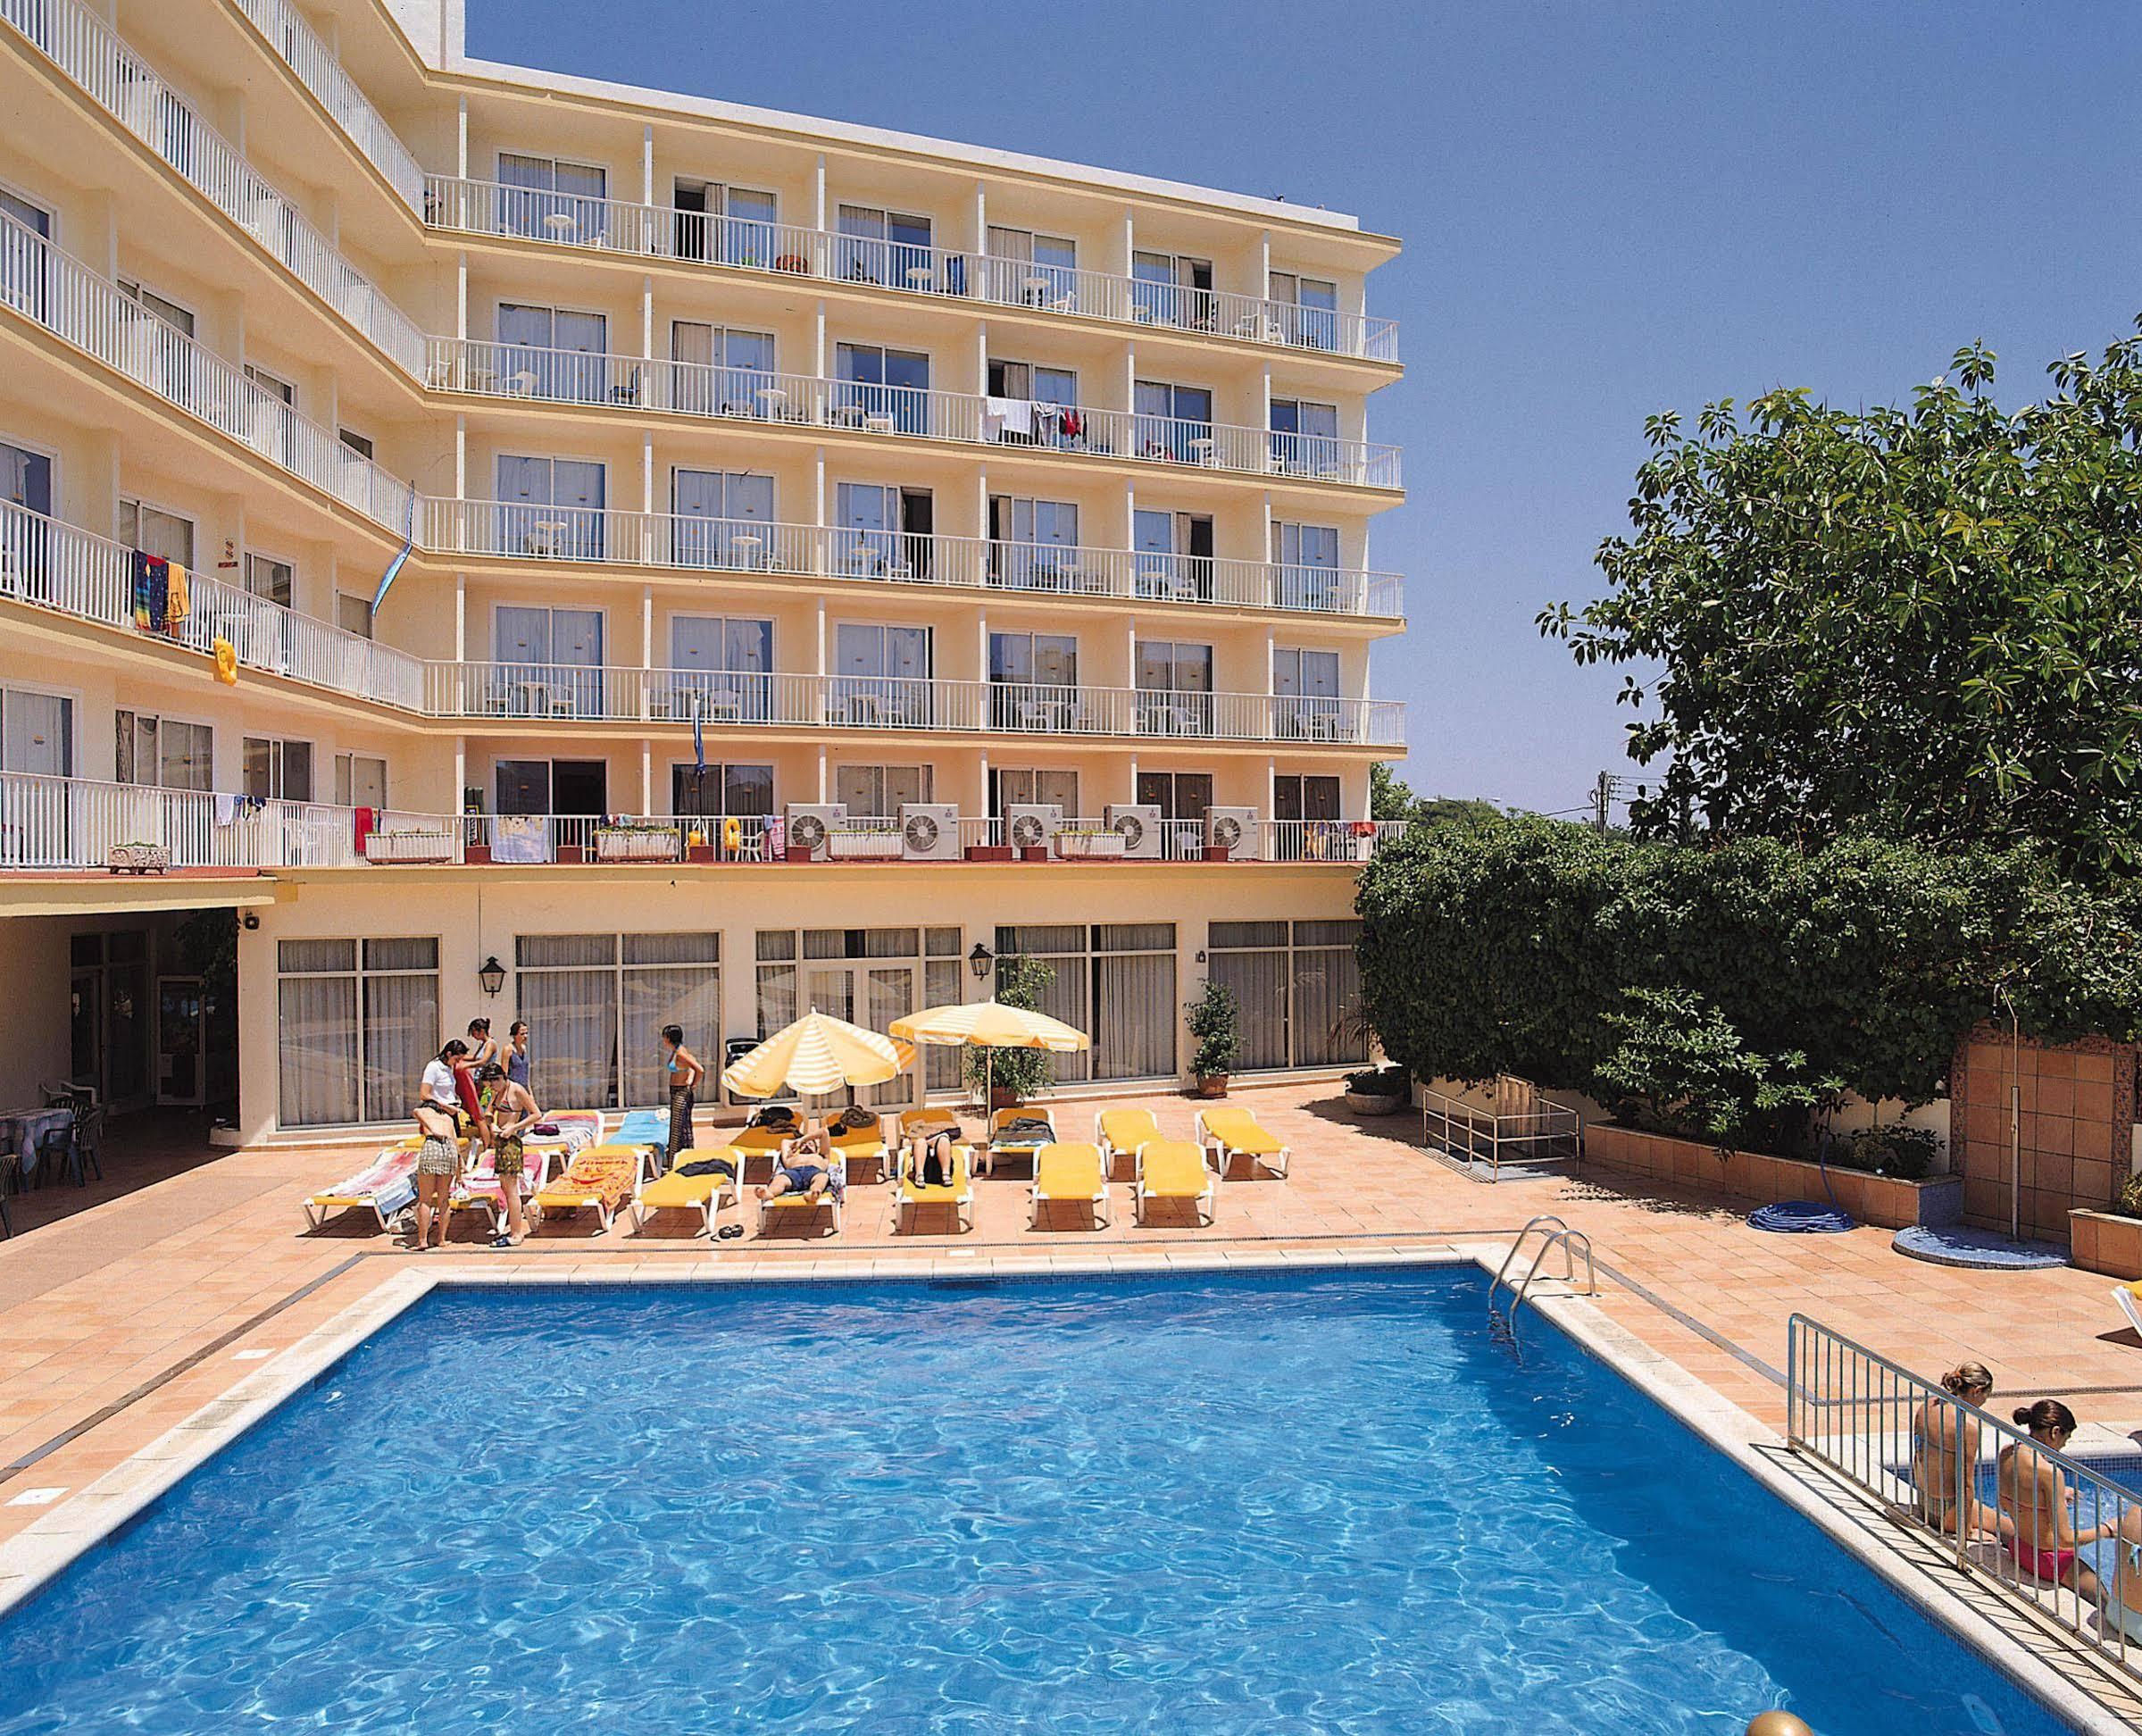 Hotel Roc Linda - Can Pastilla